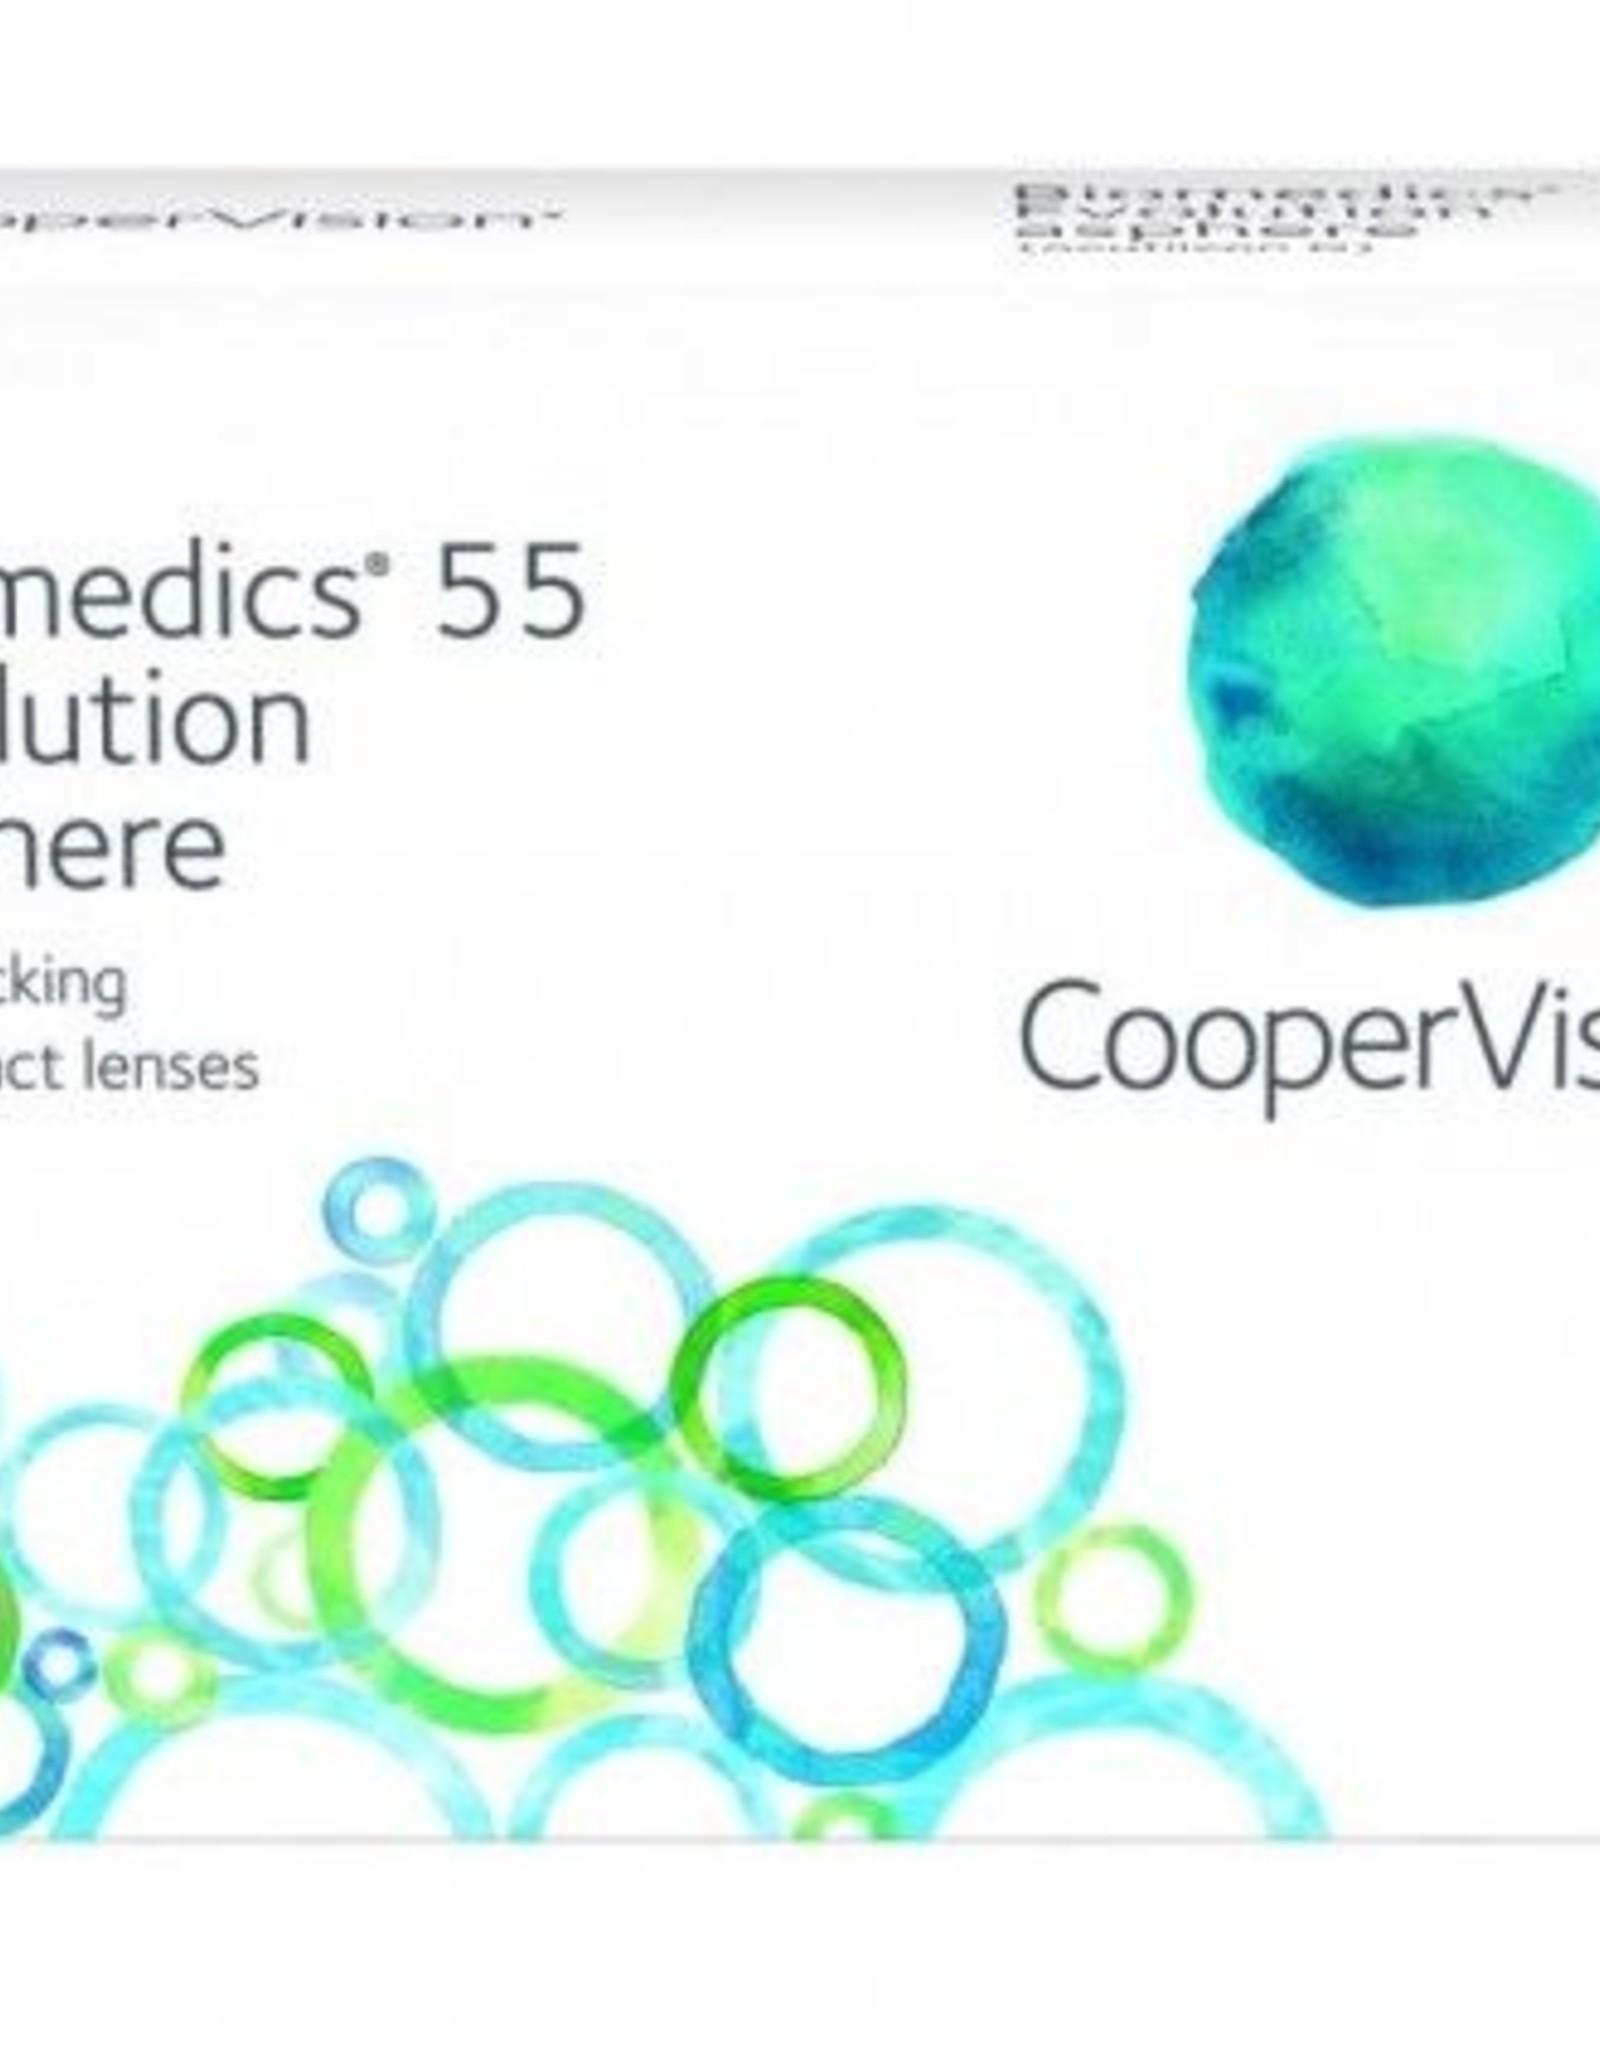 Biomedics 55 UV Evolution 6er Box